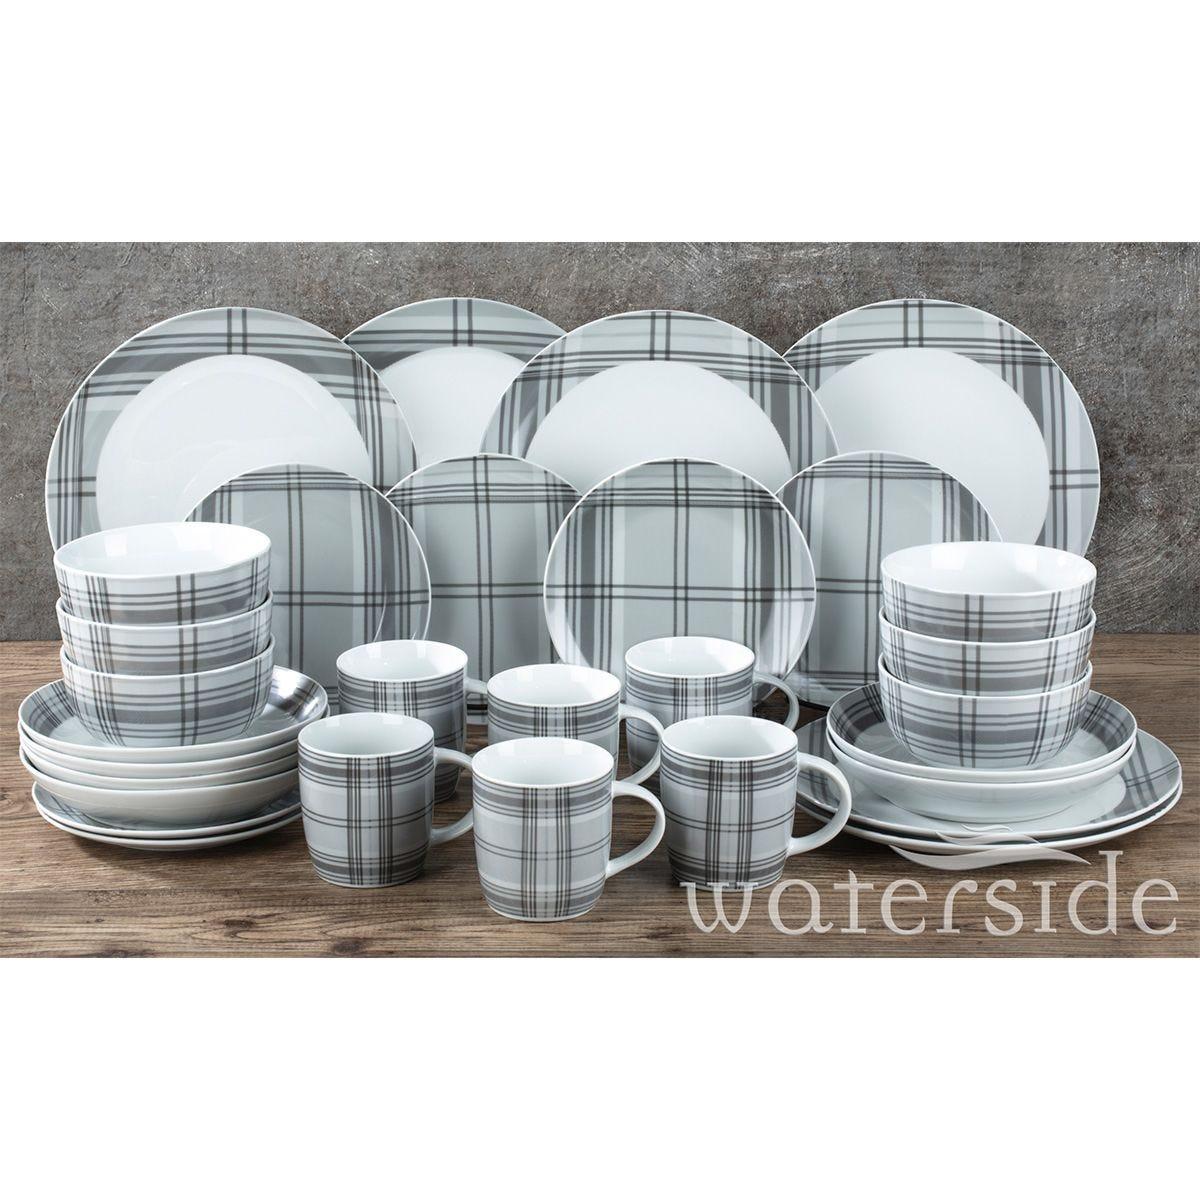 The Waterside 30pc Grey Tartan Dinner Set